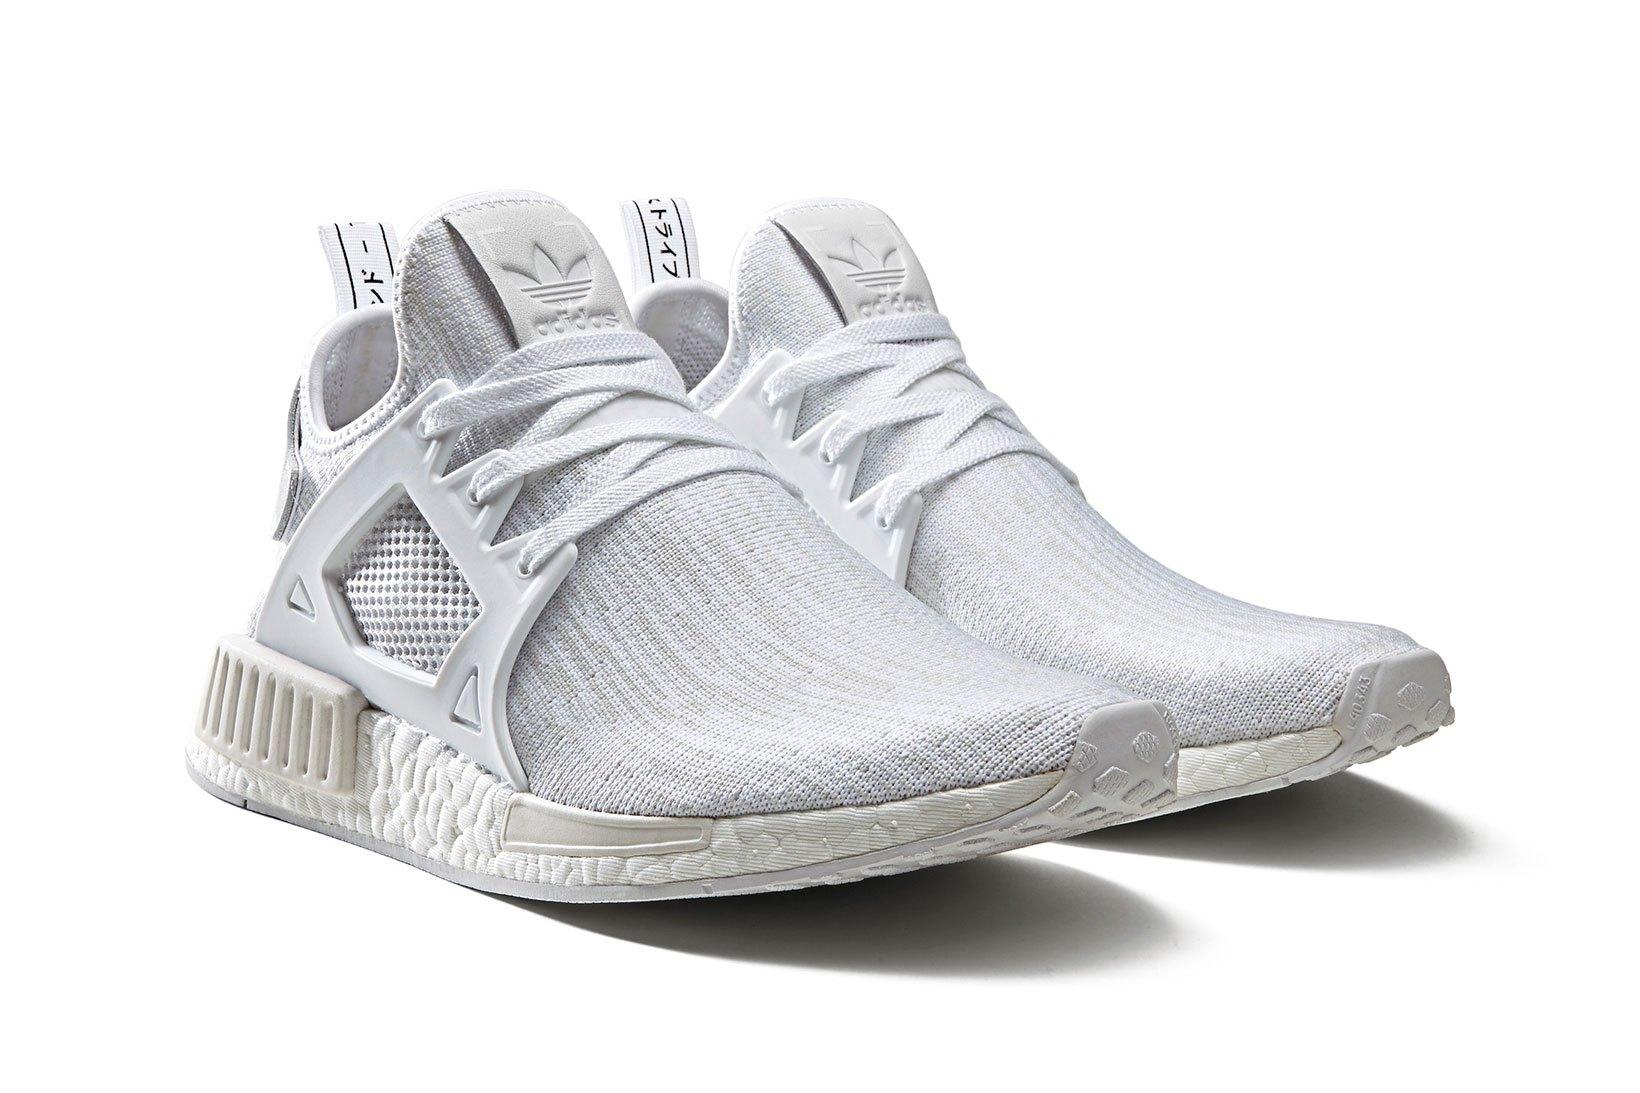 adidas-originals-nmd-xr1-white-sneaker-2